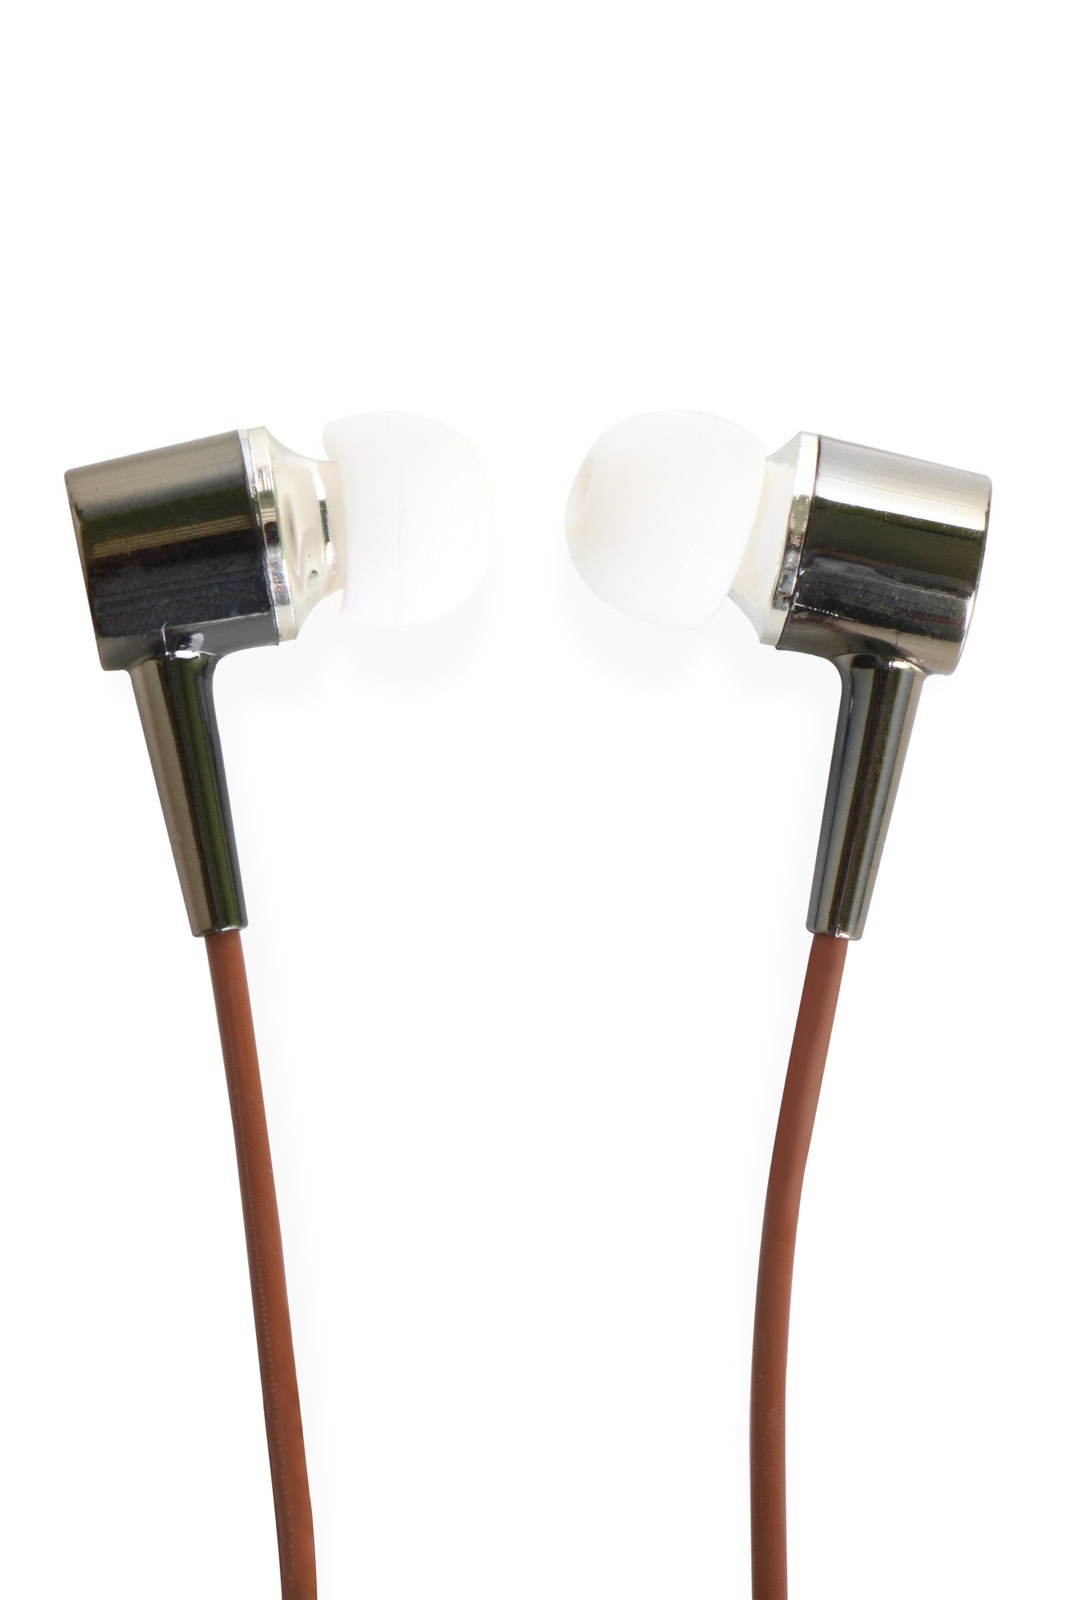 Беспроводные наушники iNeez Wireless Sport Stereo, коричневый наушники uproar wireless